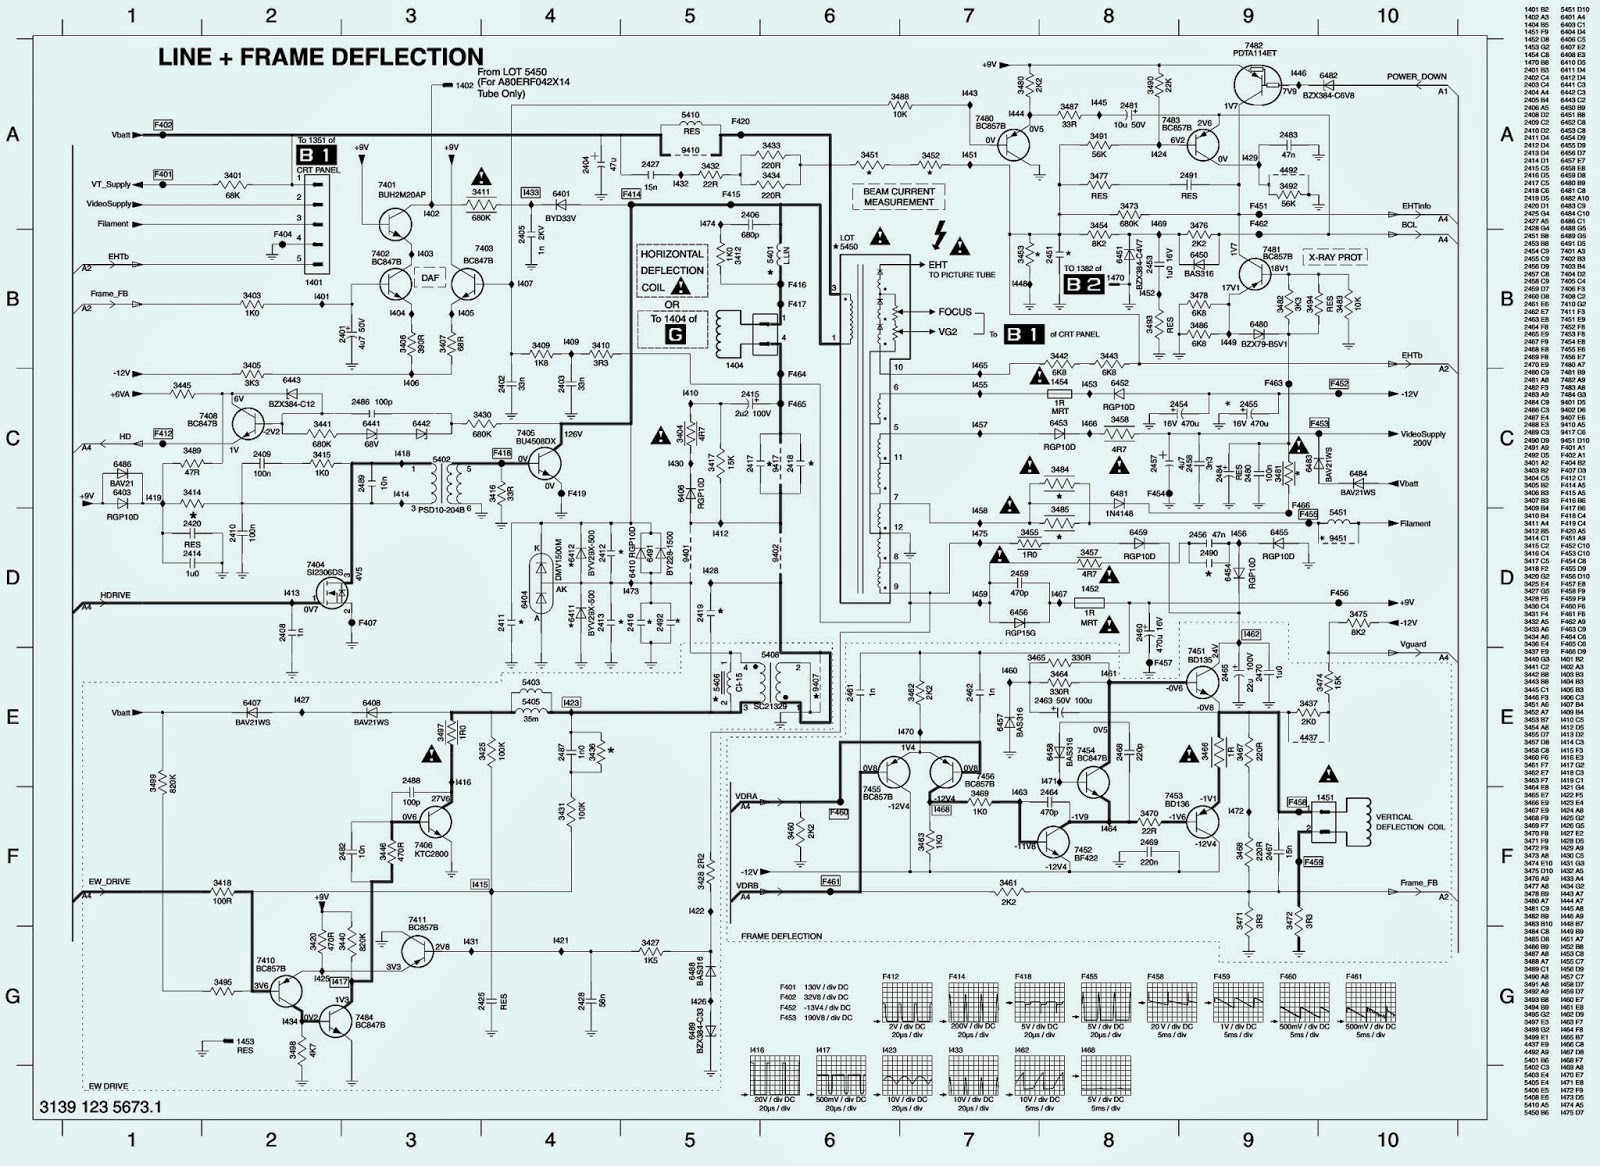 tv schematic circuit diagram satellite cable tv wiring sanyo tv wiring diagram [ 1600 x 1166 Pixel ]